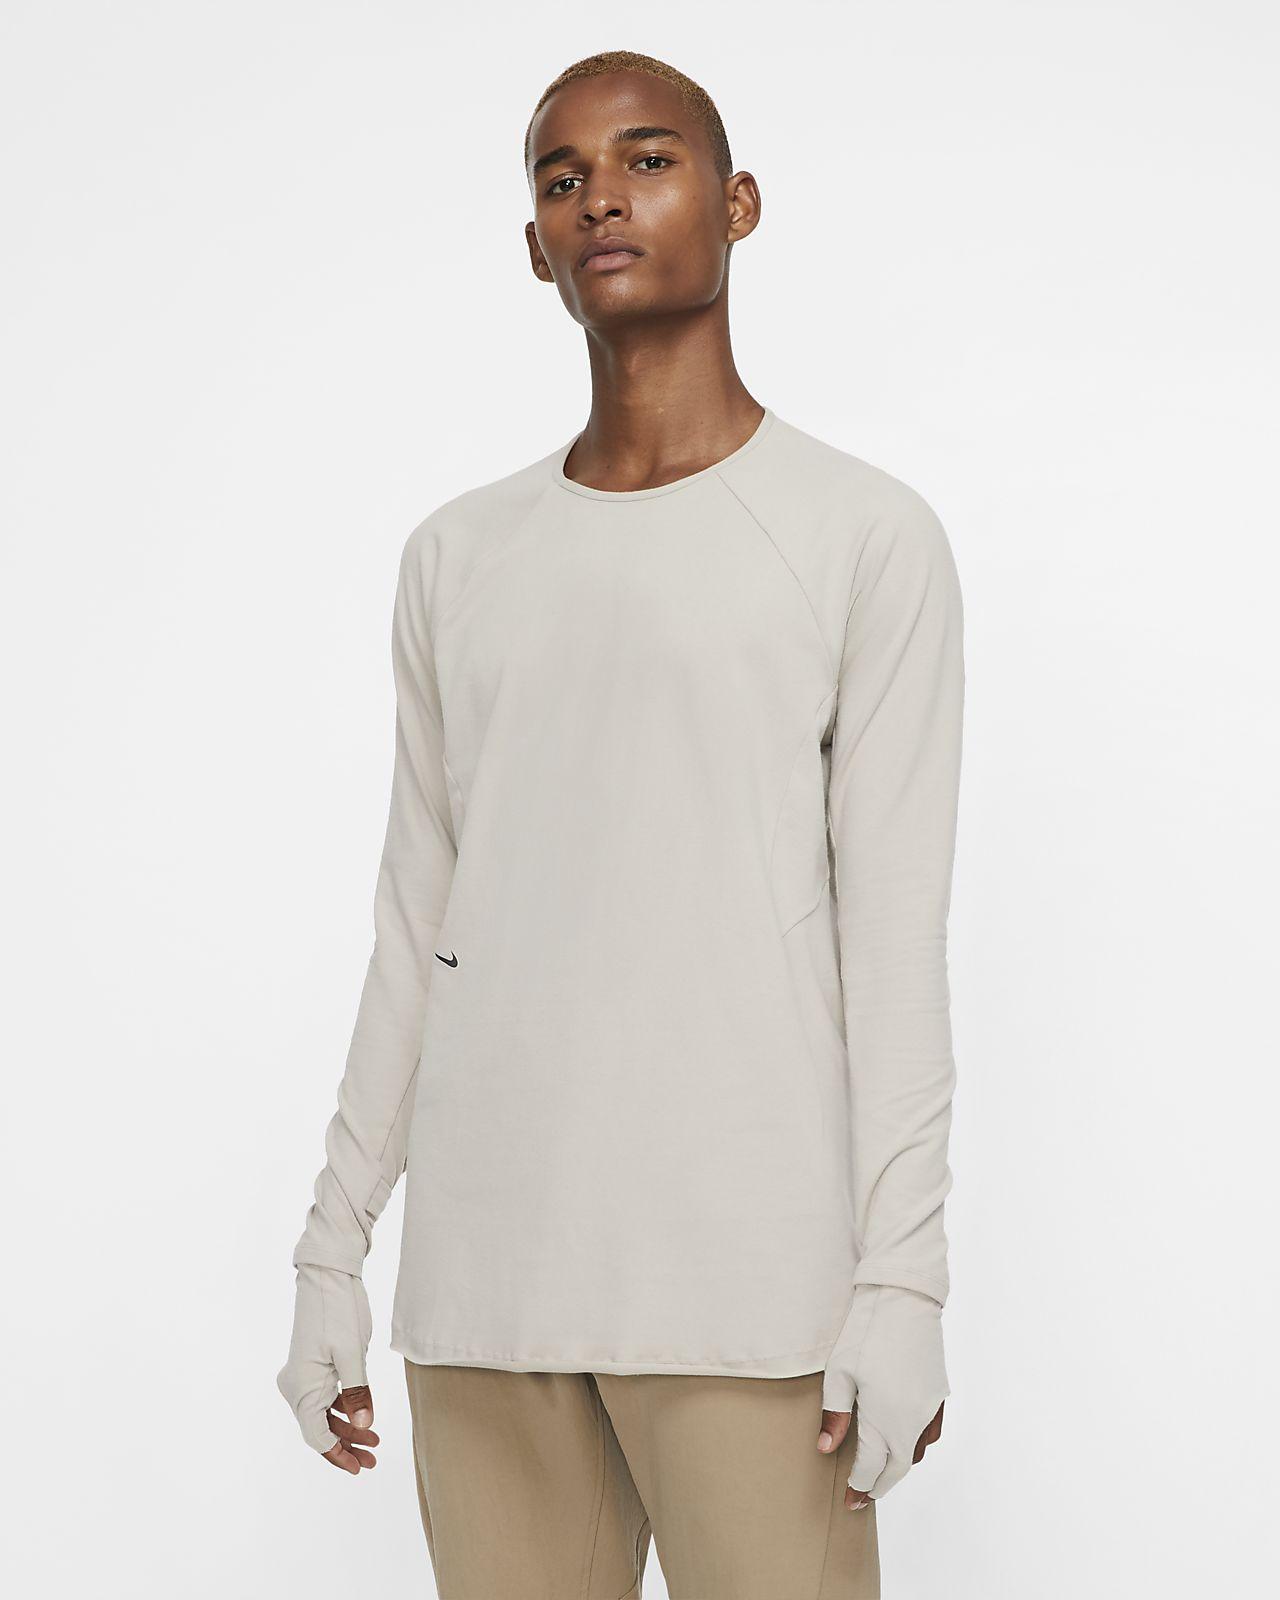 Nike Sportswear AAE 3.0 男子上衣